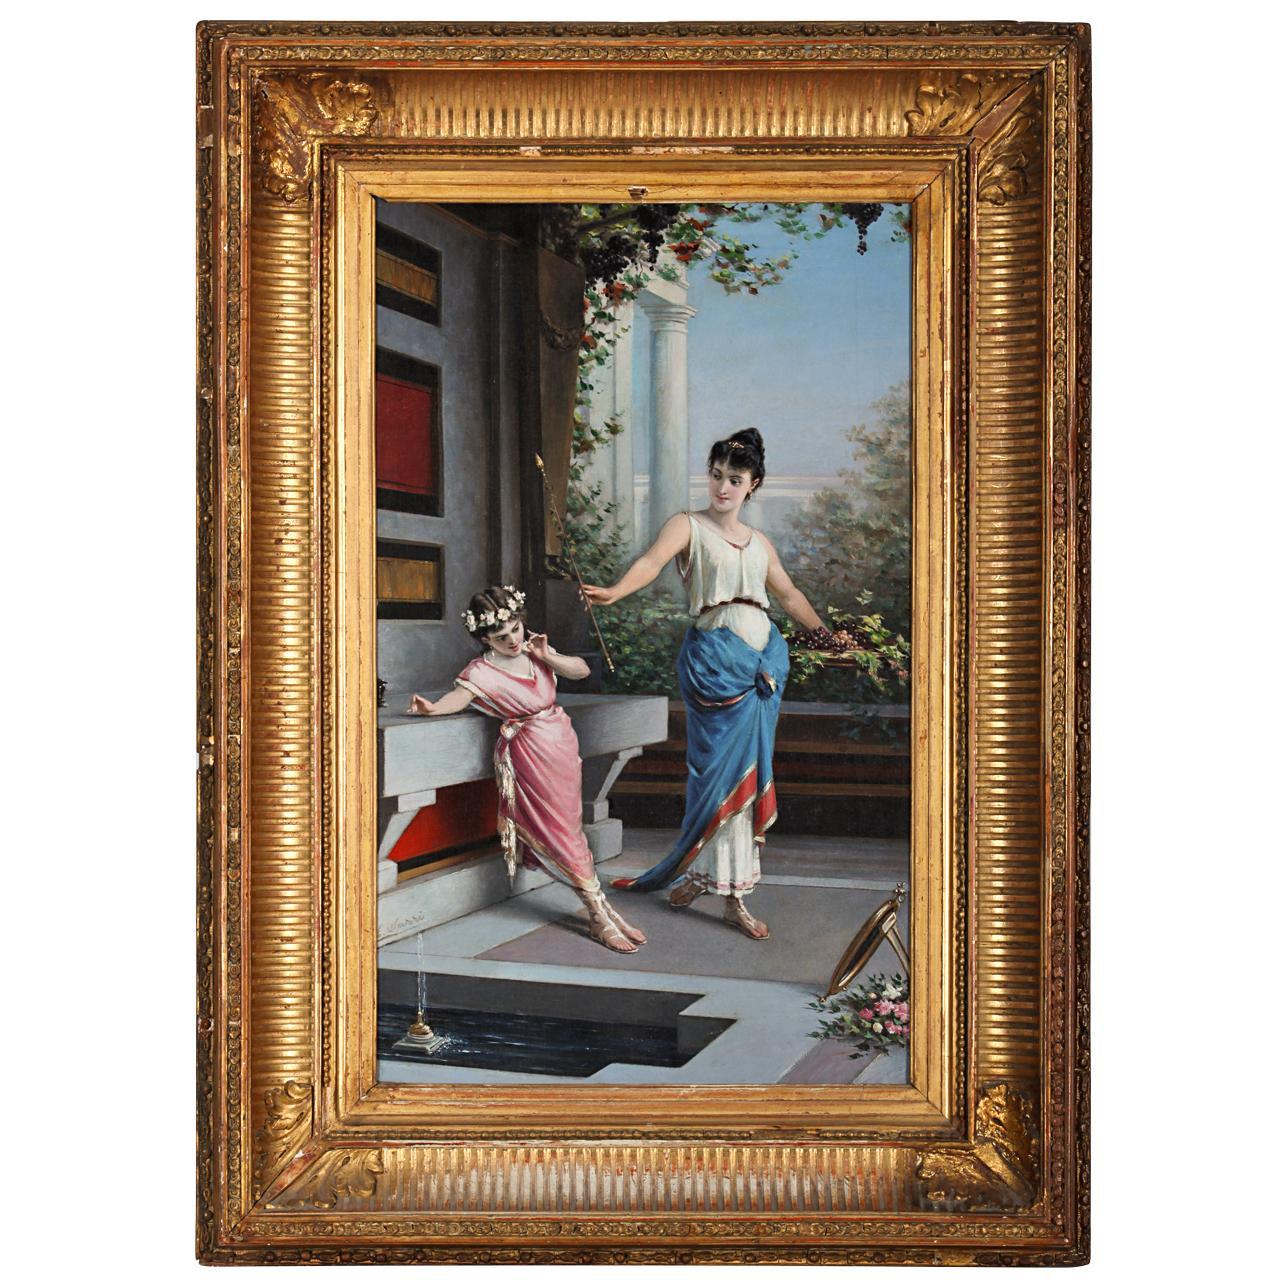 Pompeian Scene 19th century Painting Oil on Canvas Signed  Egisto  Sarri